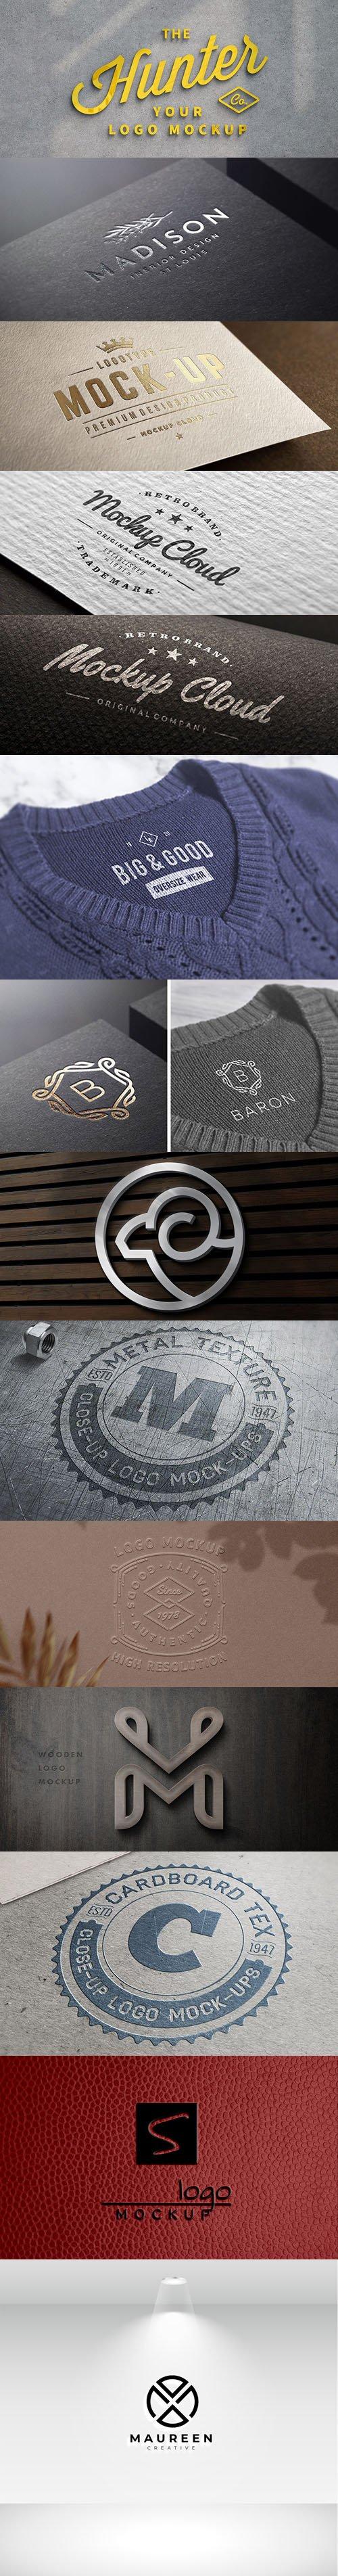 Awesome 9 Branding Logo PSD Mockups Templates